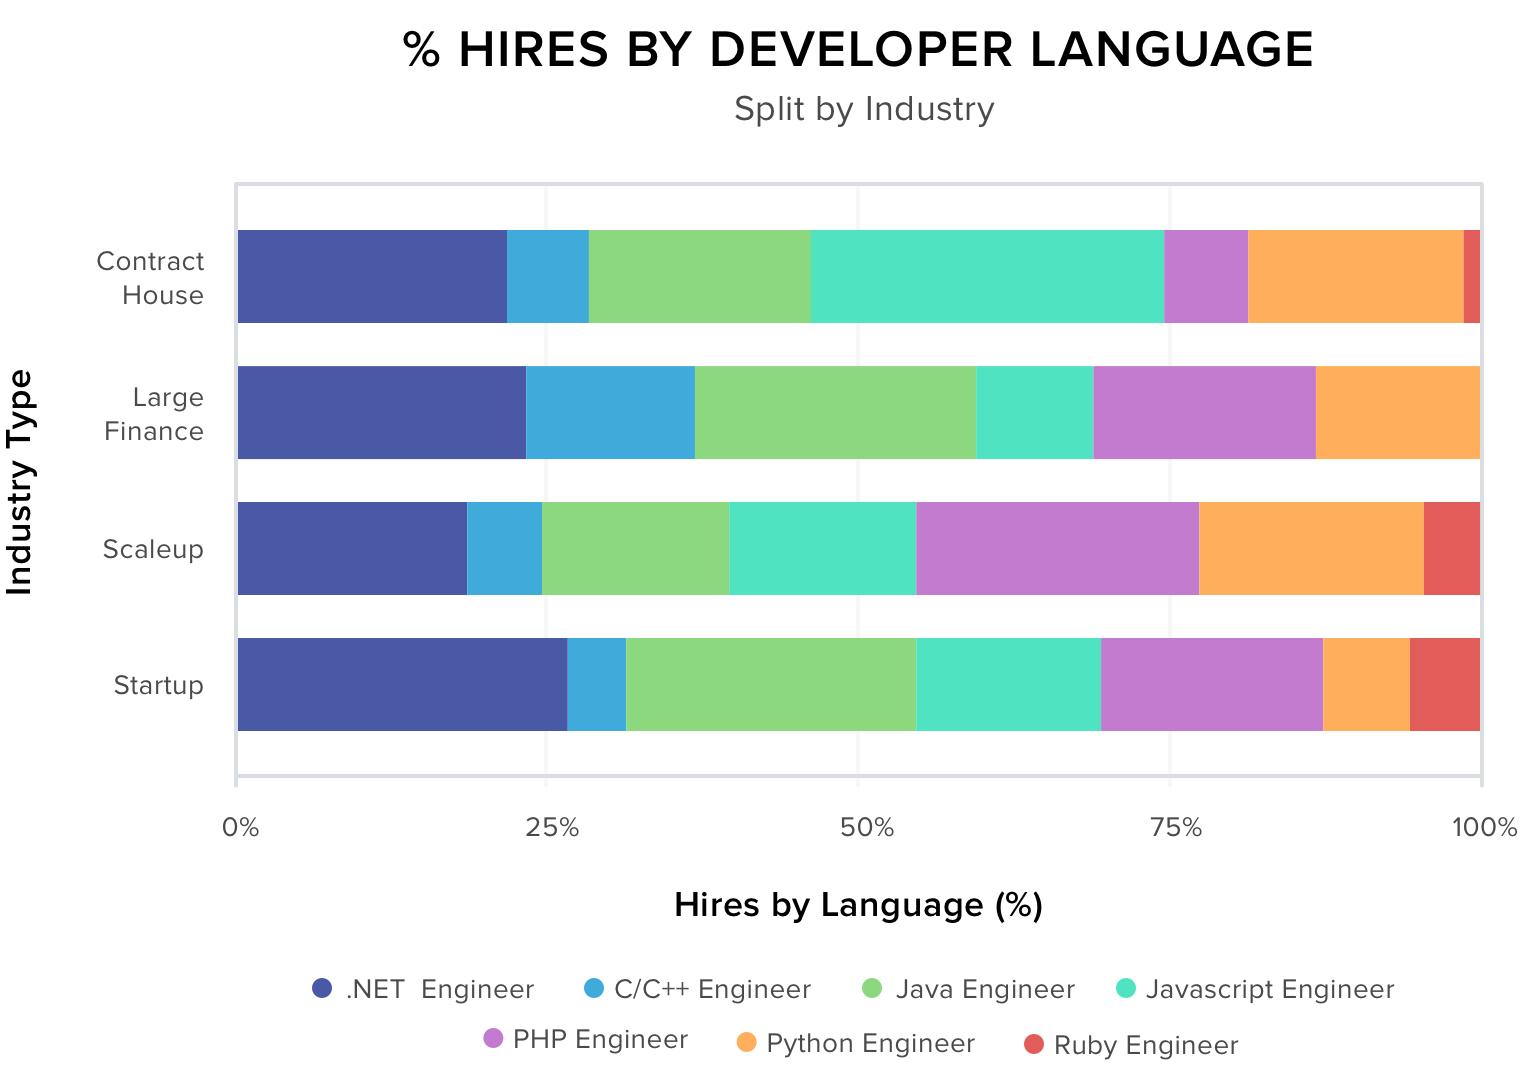 % Hires by Developer Language